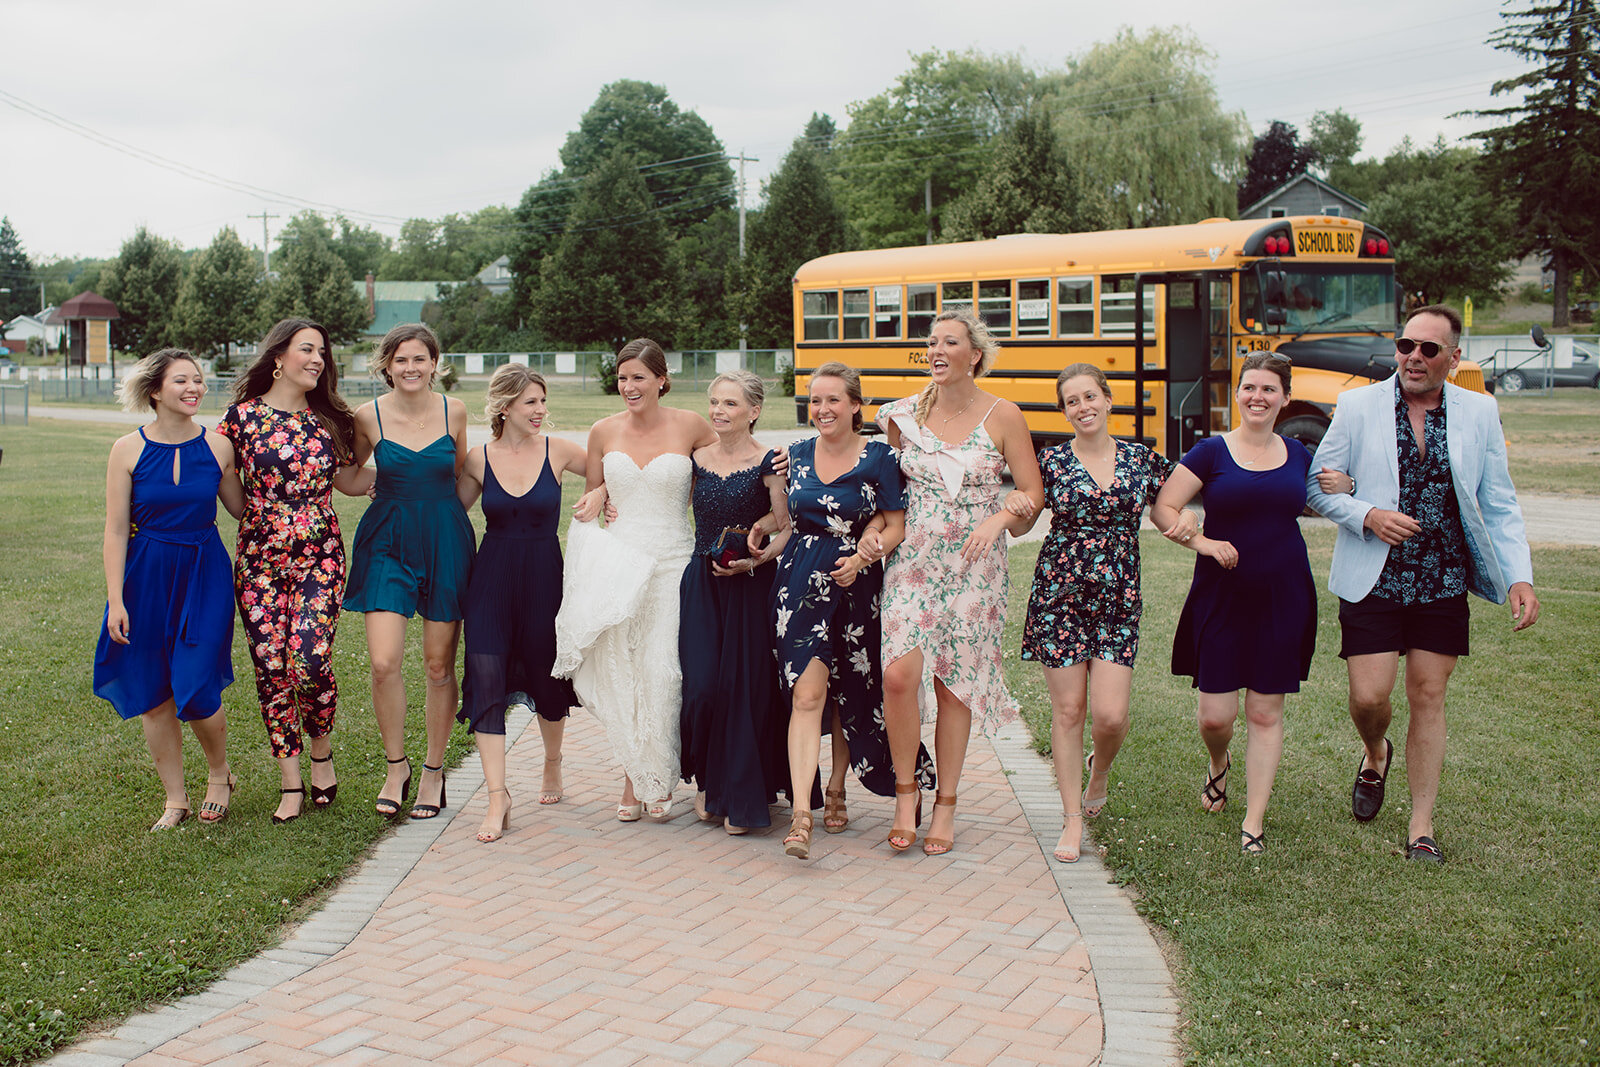 Roseneath-wedding-love-bee-photography-158_websize.jpg